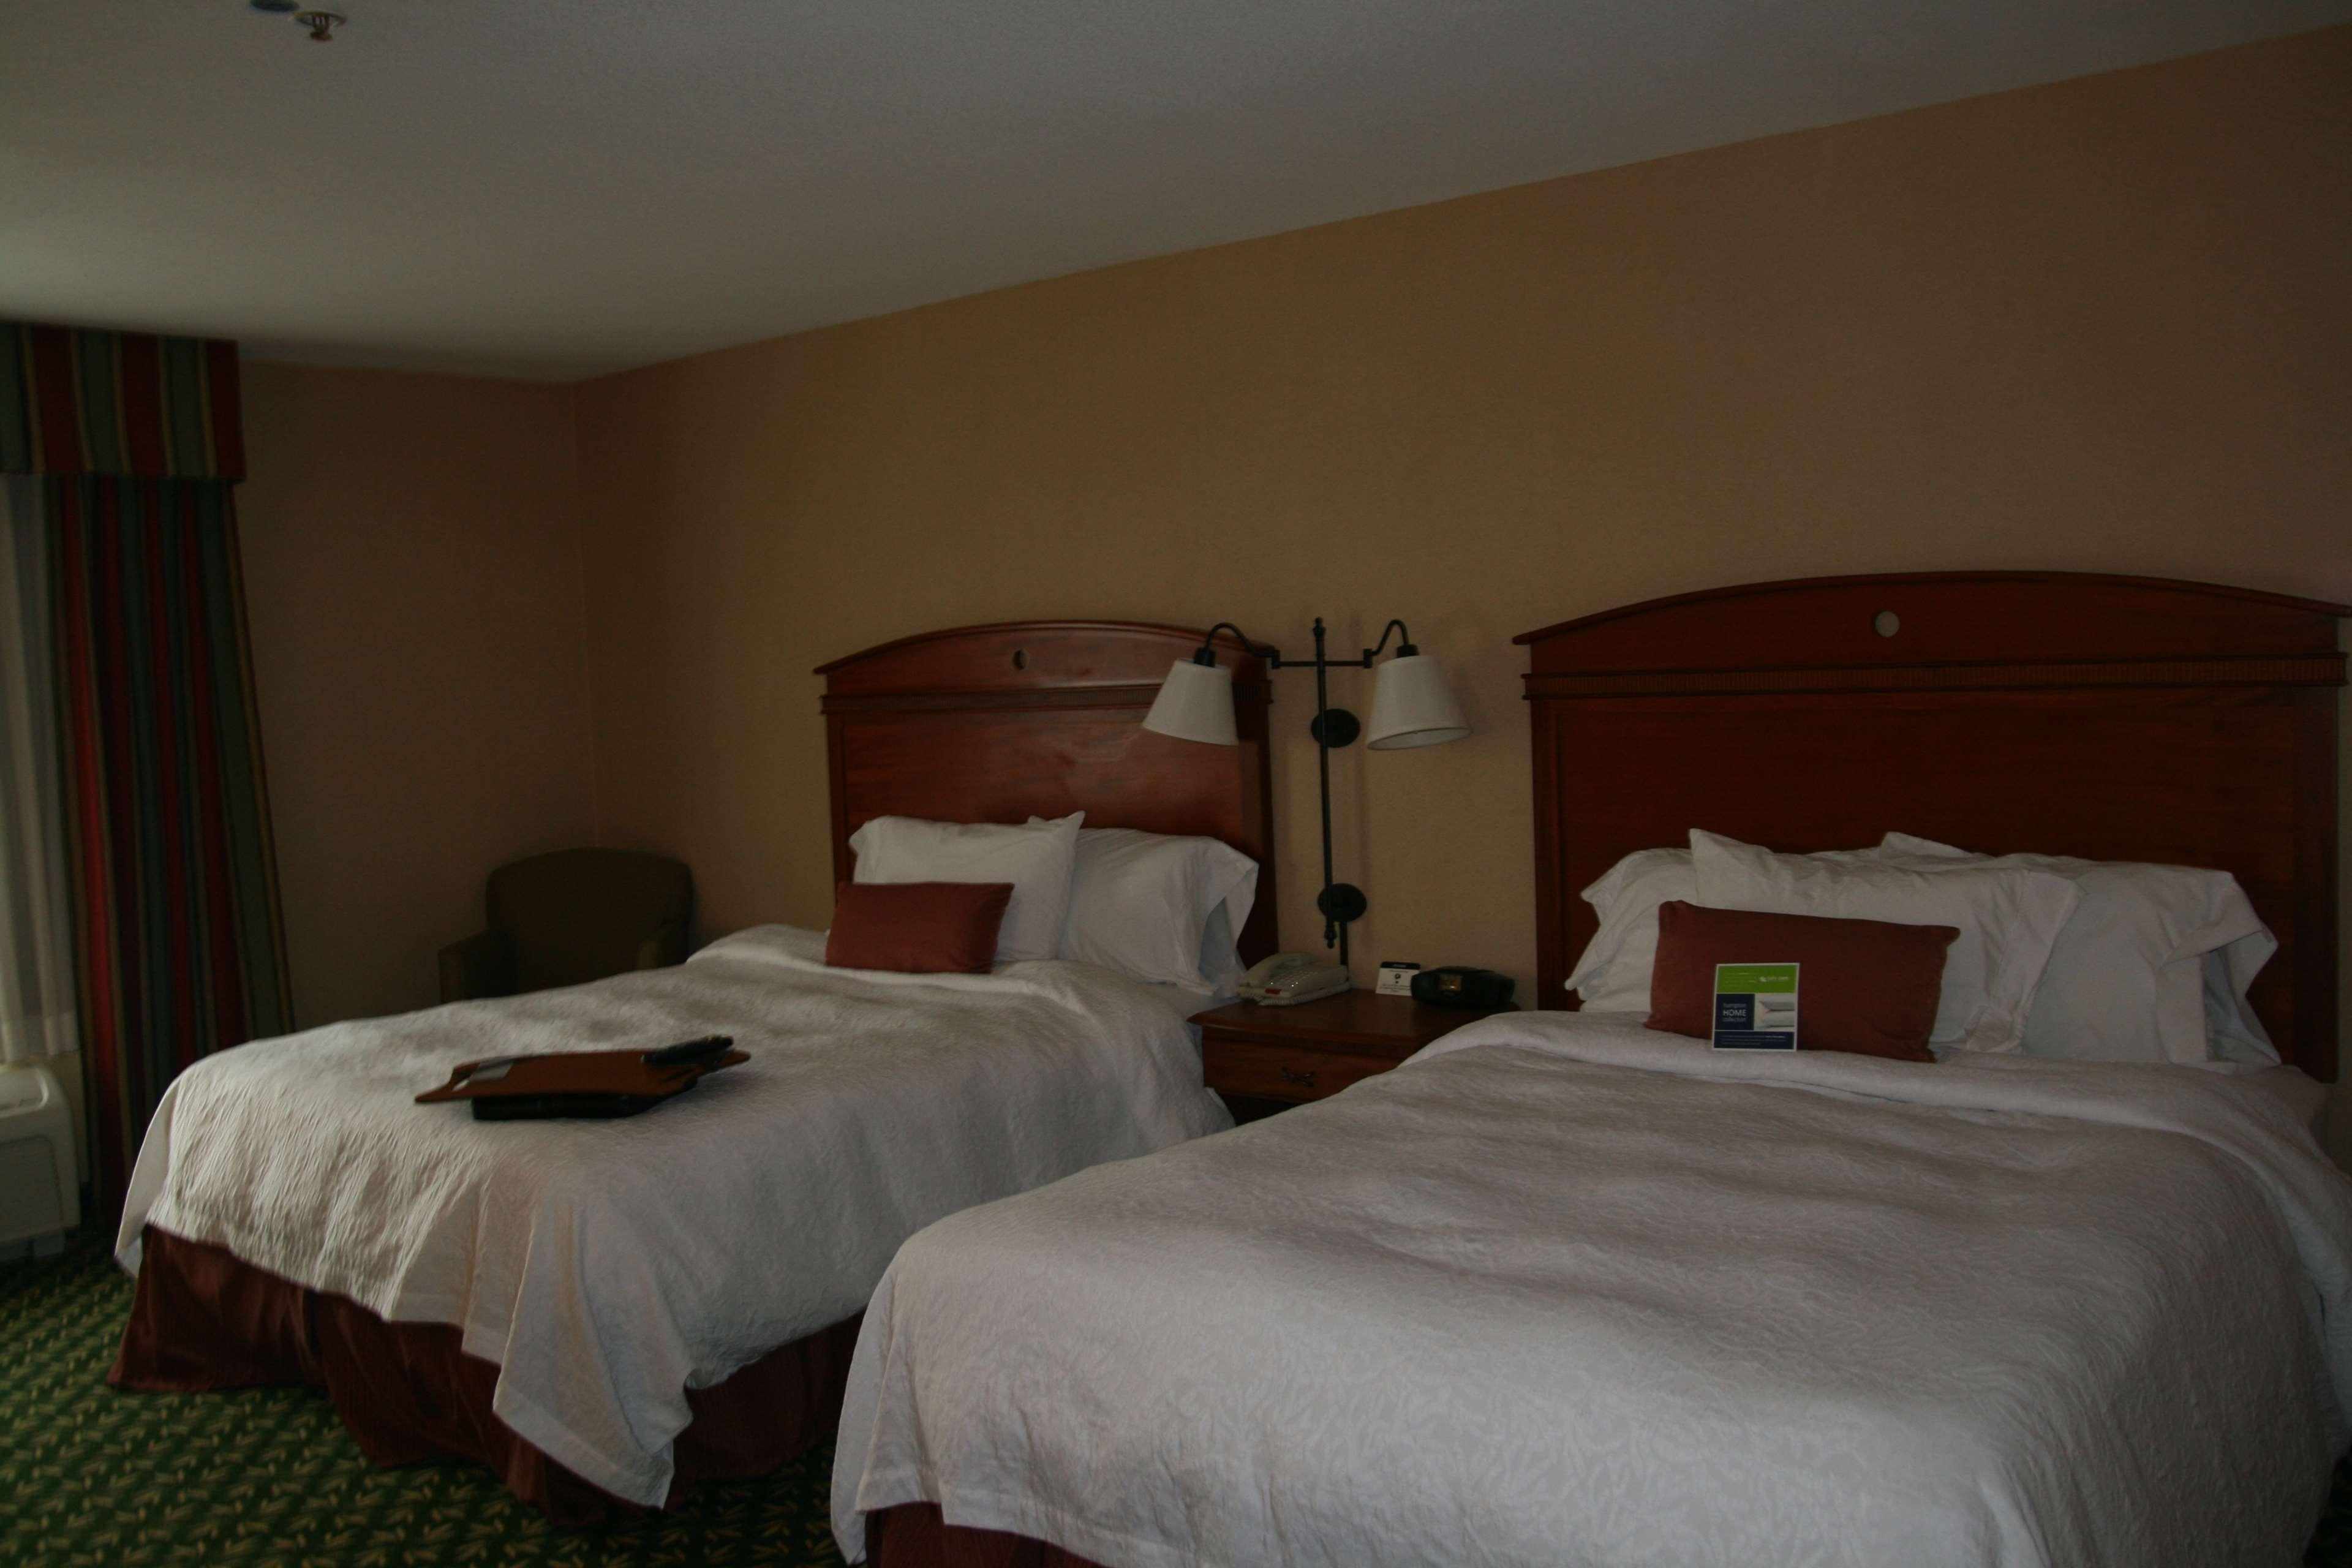 Hampton Inn & Suites Rohnert Park - Sonoma County image 11